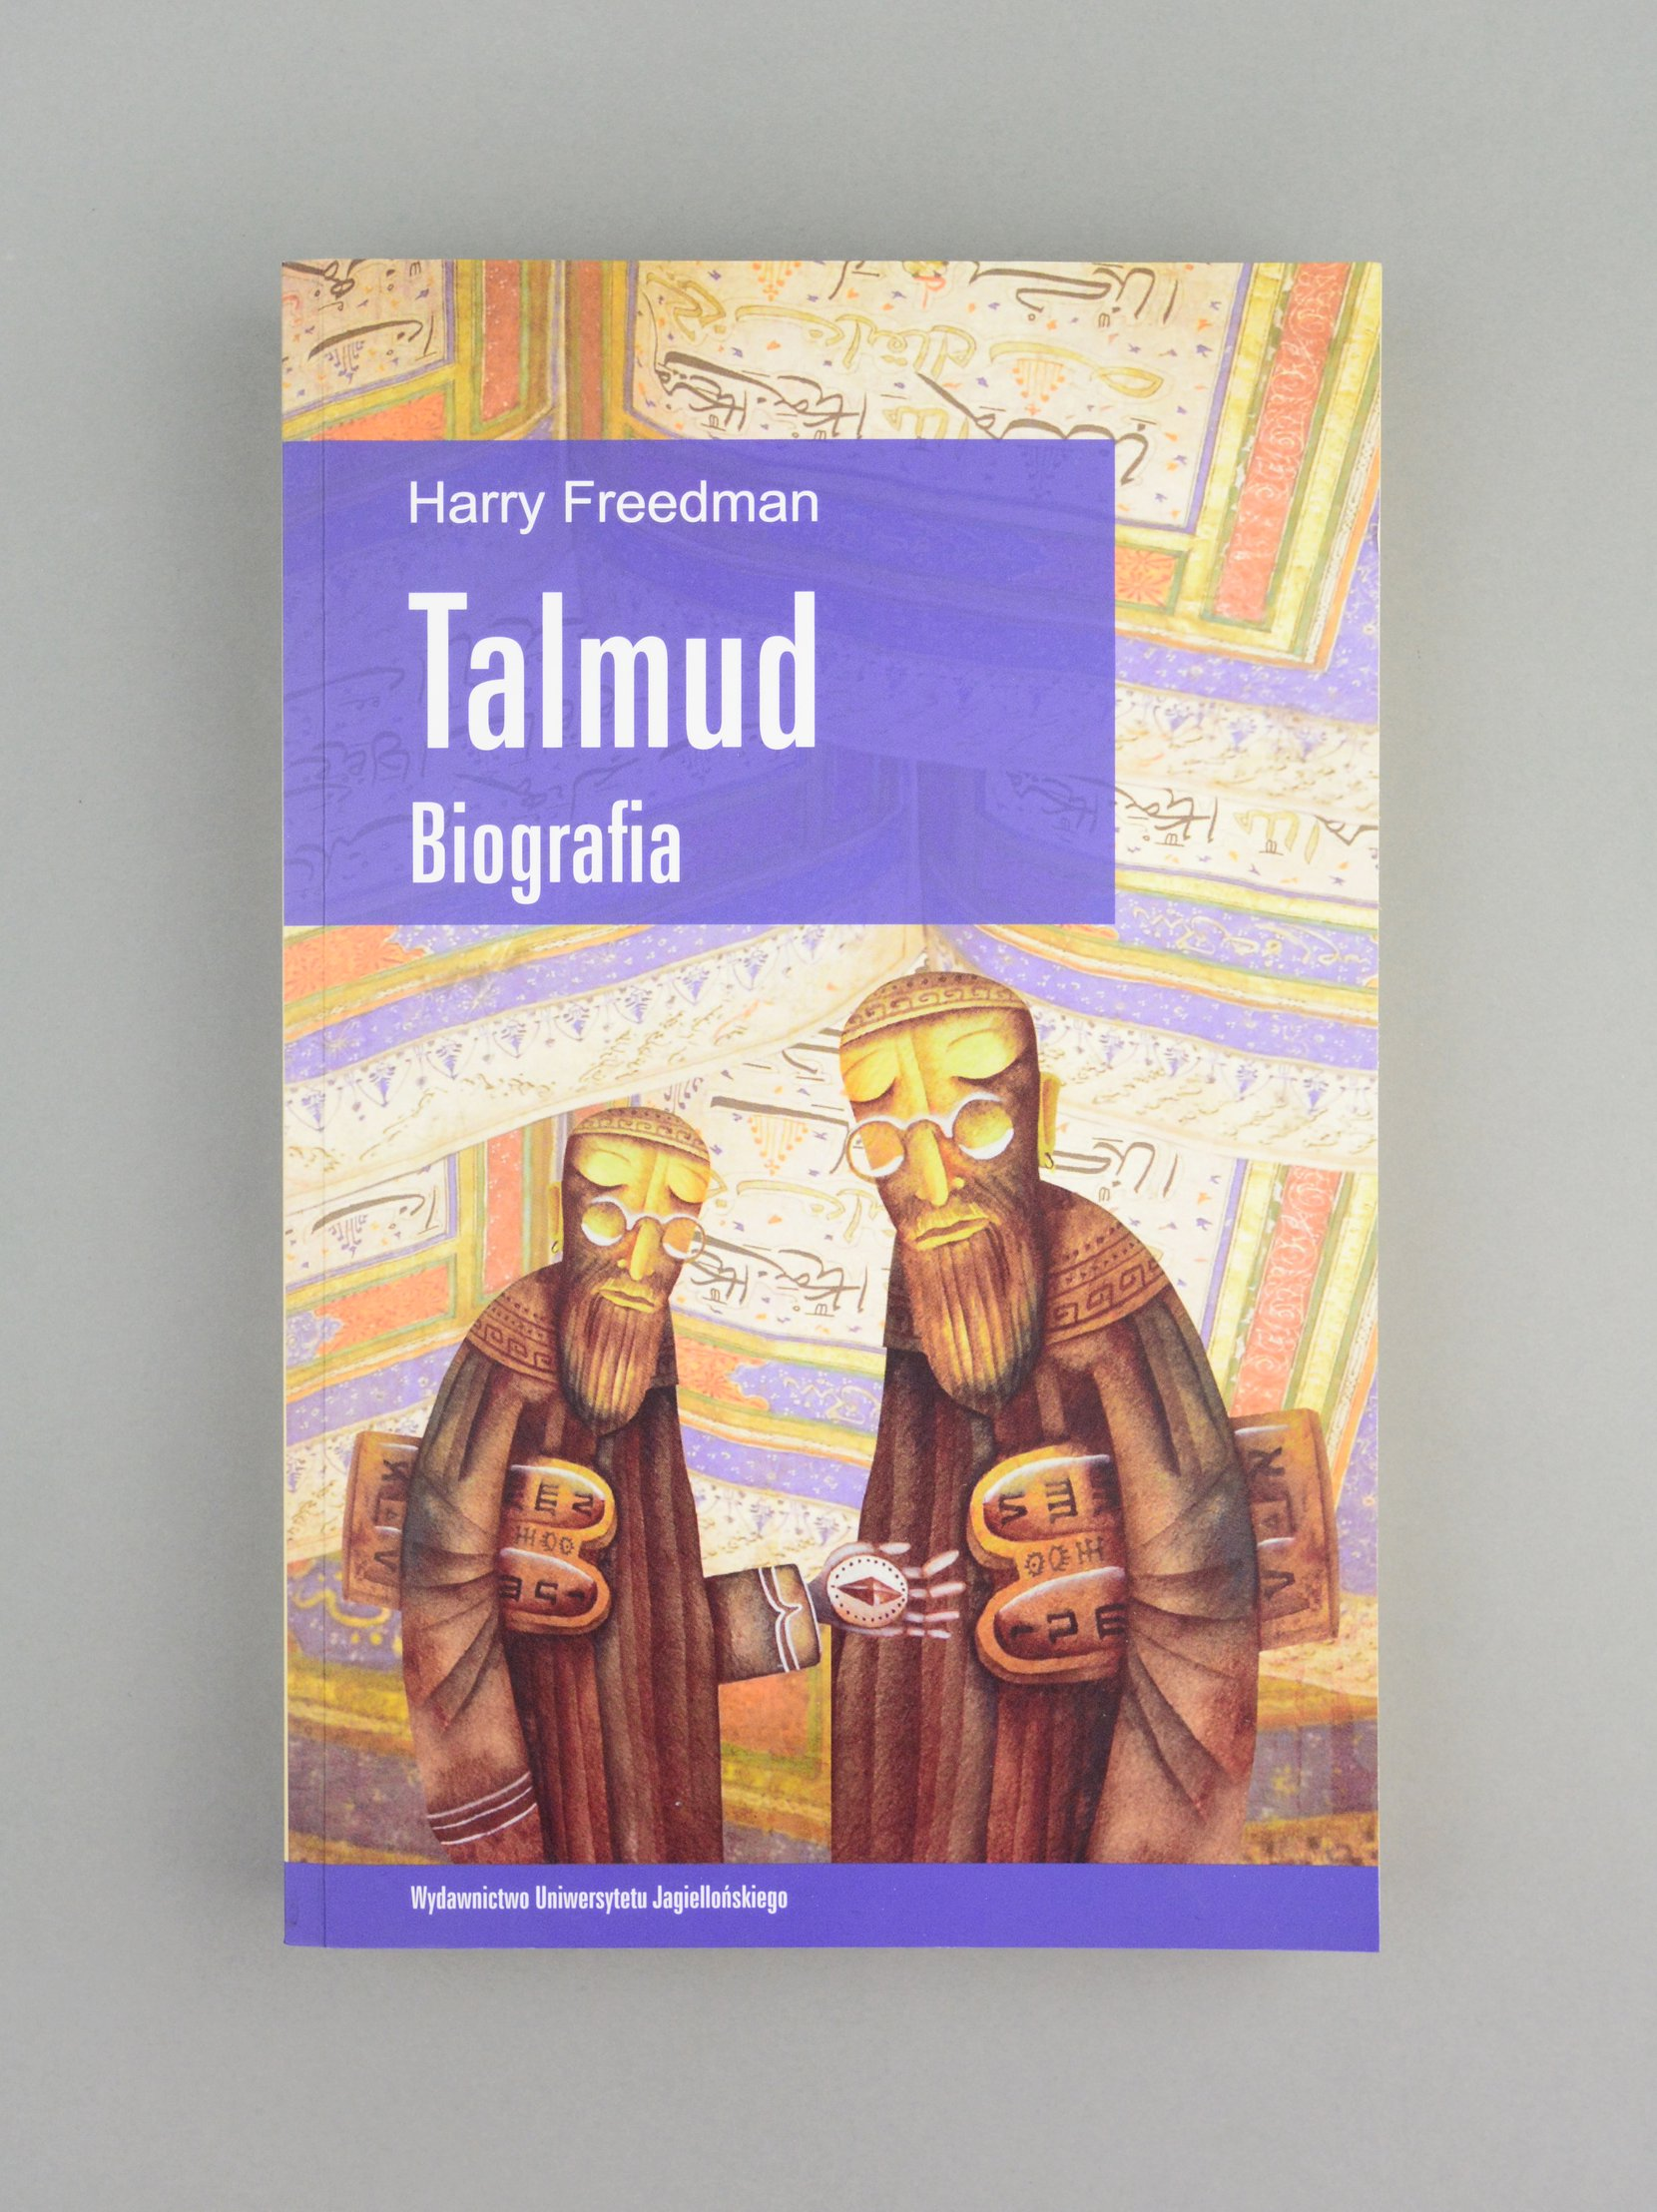 harry freedman: talmud. biografia, 2015 books history Harry Freedman